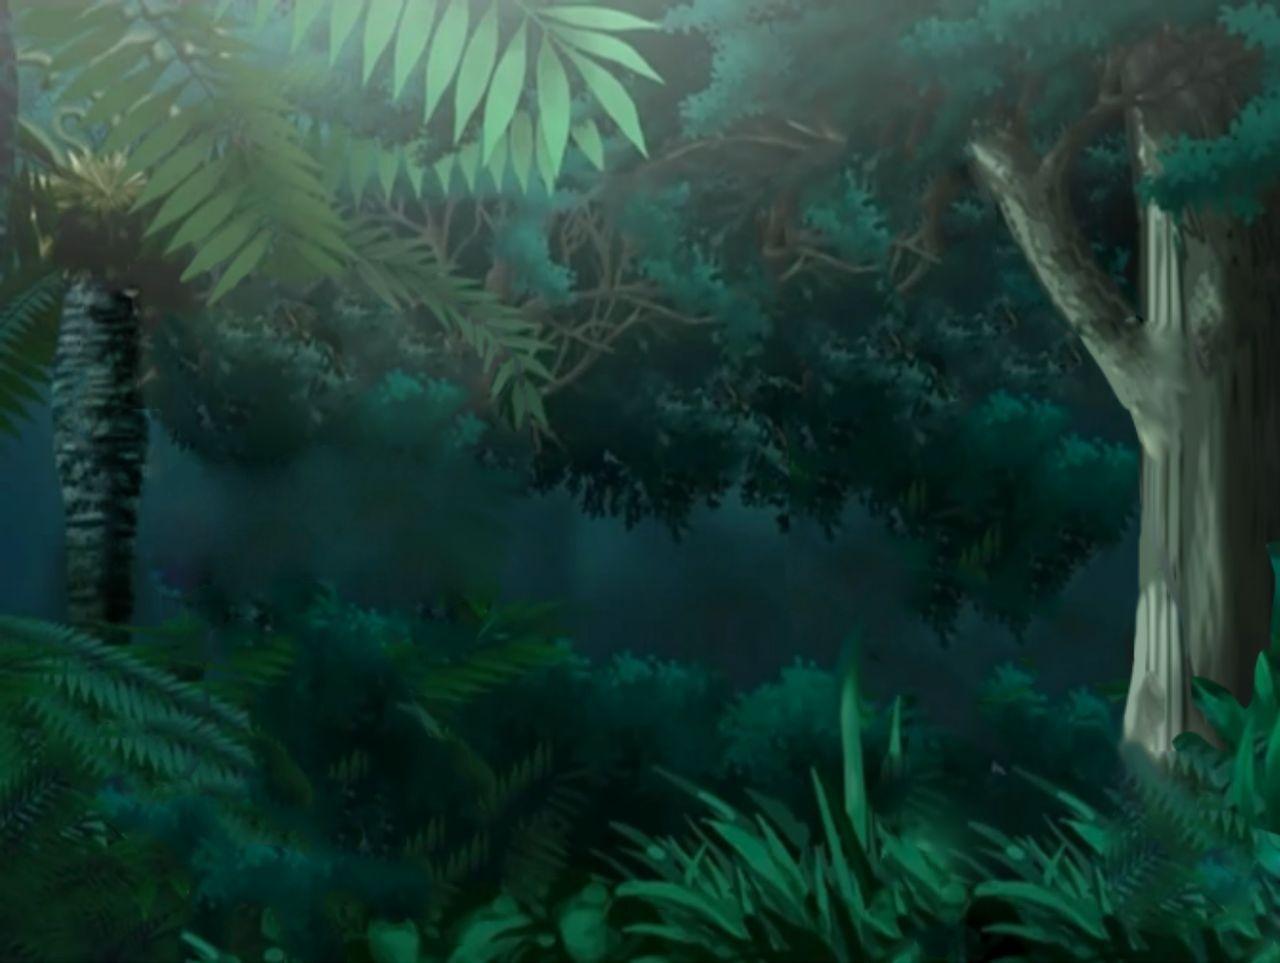 Sonic X Background 27 By Recolouradventures On Deviantart Digital Artist Background Deviantart